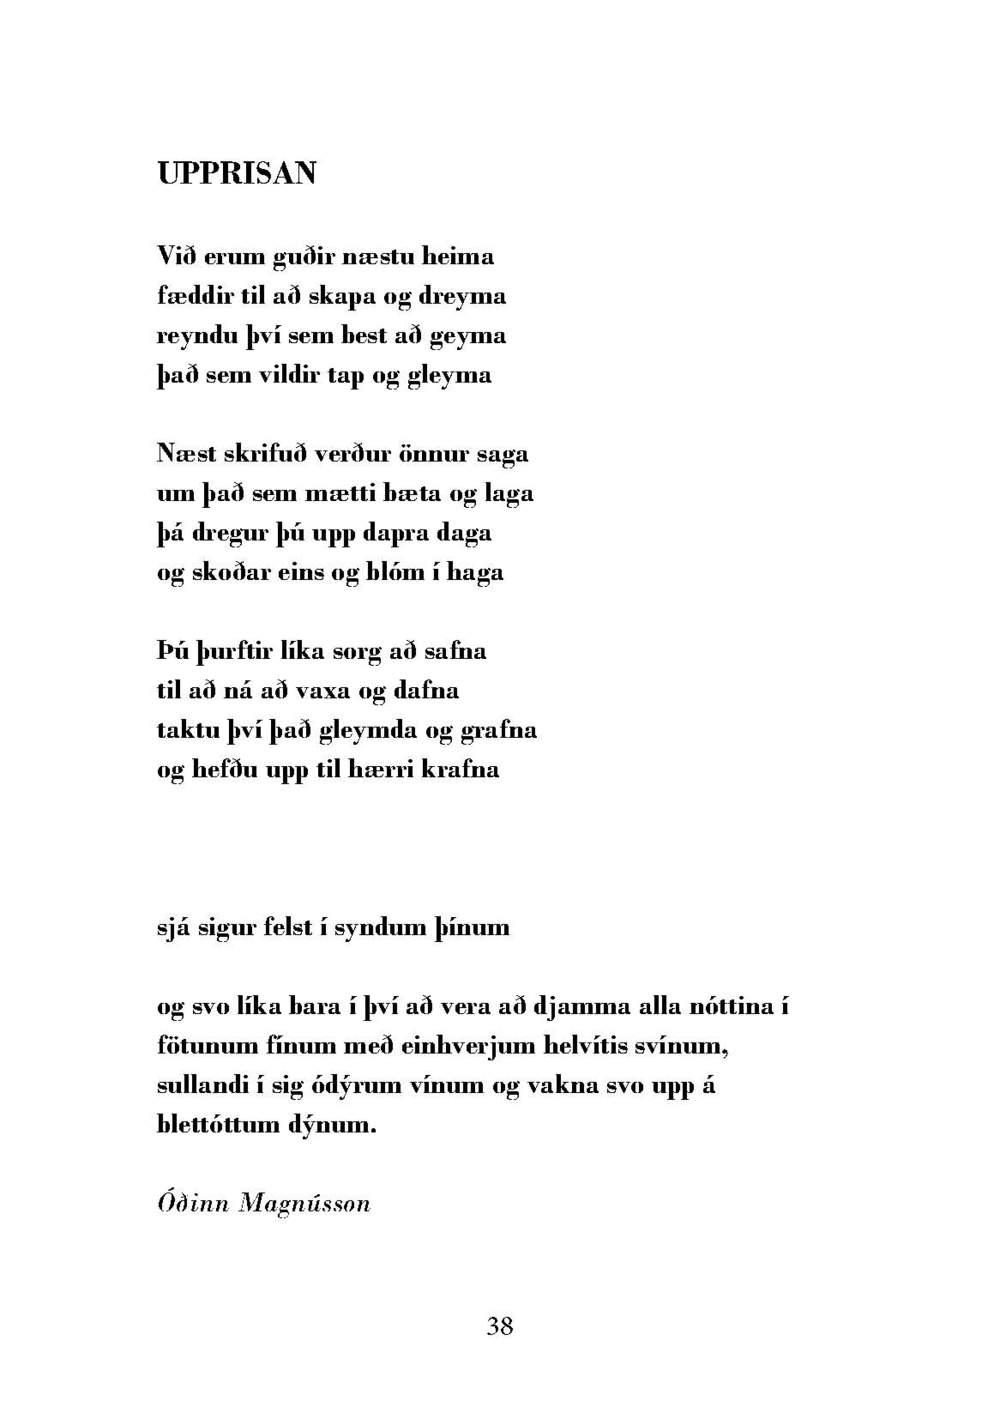 27073-ljodabokin--oll_Page_83.jpg